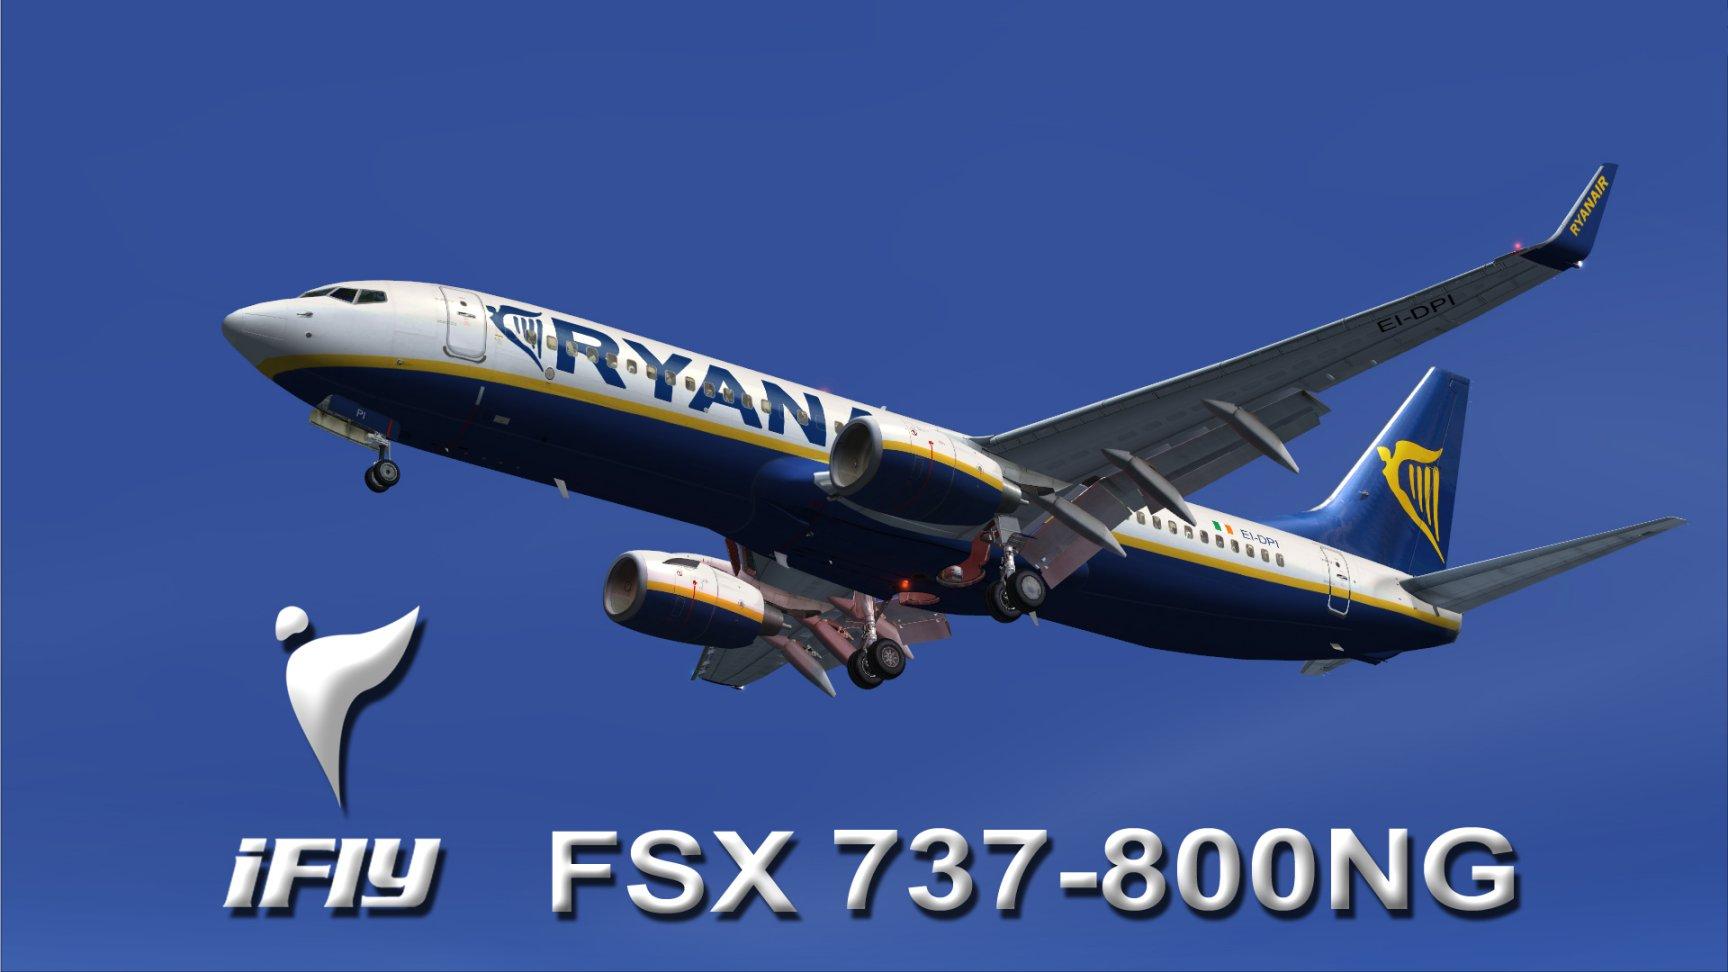 iFly 737 fsx [sitemap] - :: Flying Way ::